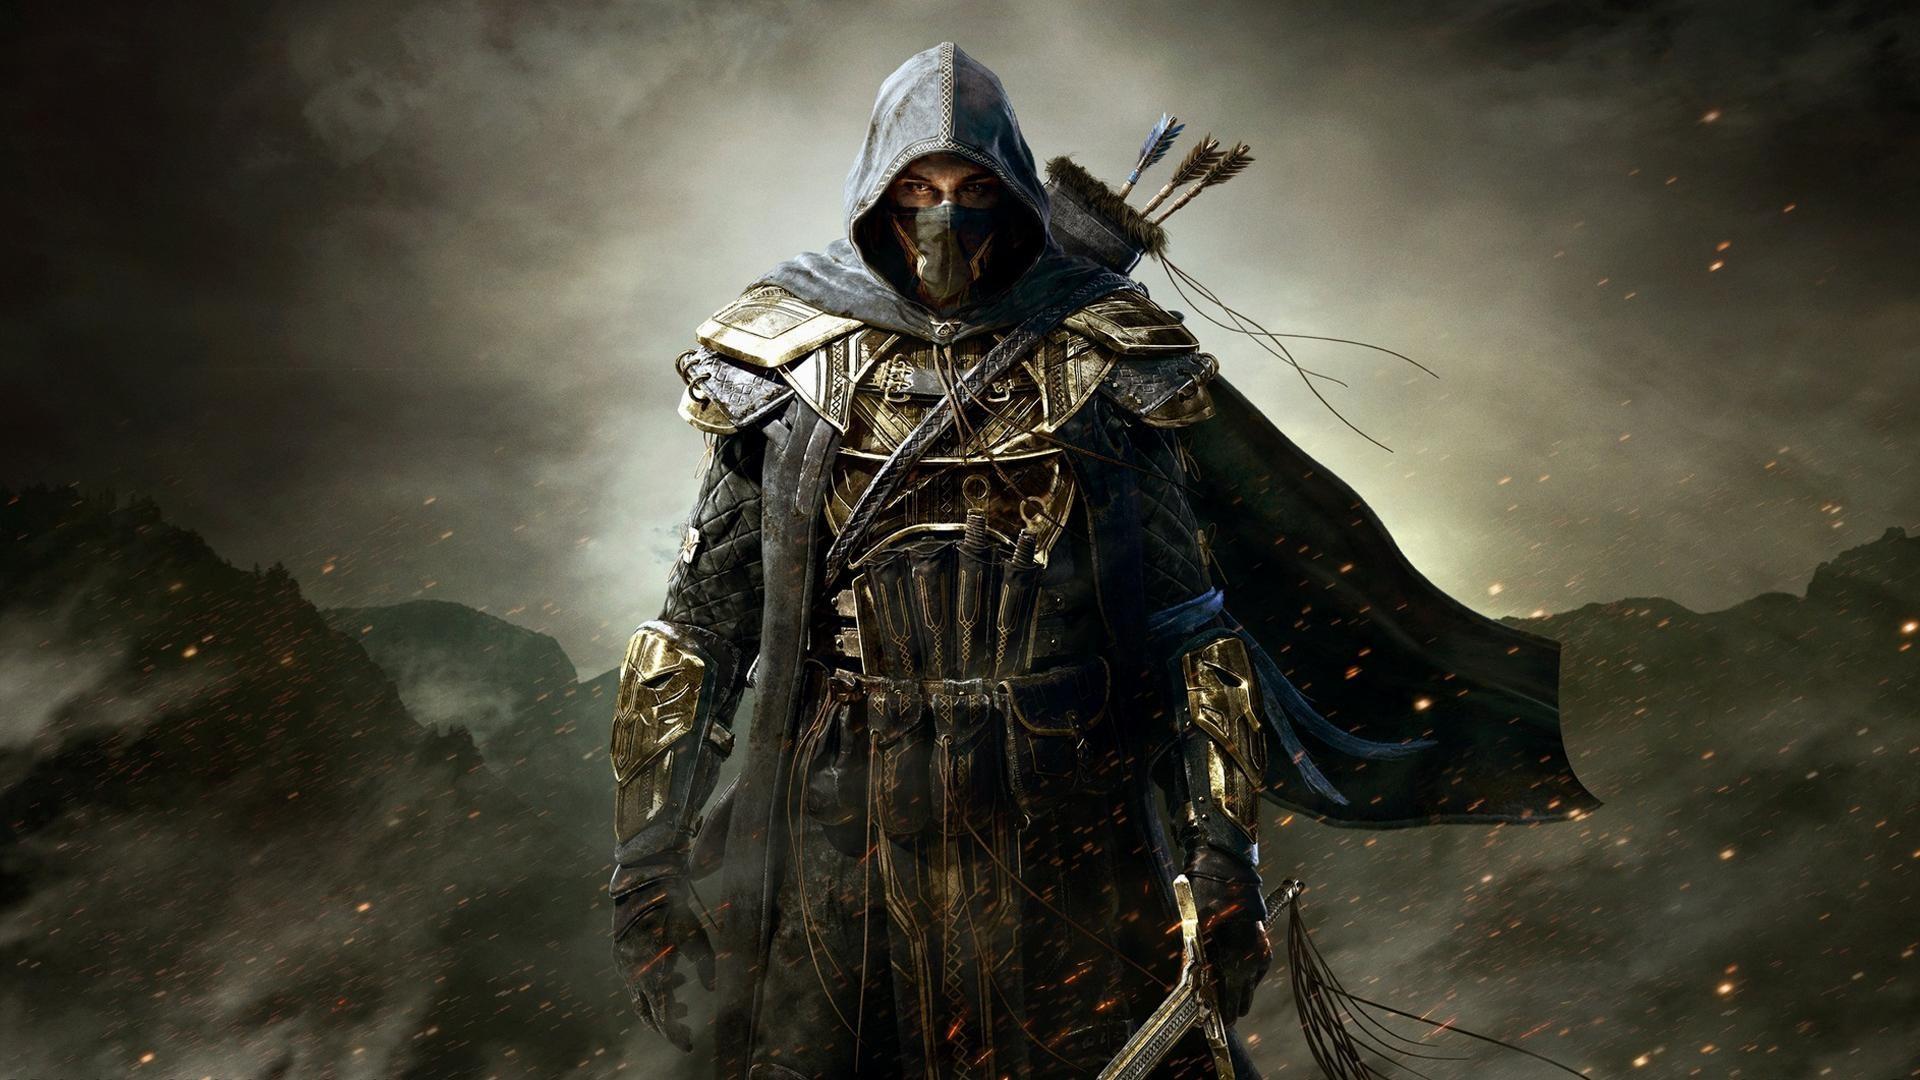 wallpaper.wiki-Dark-Souls-2-Backgrounds-Free-Download-